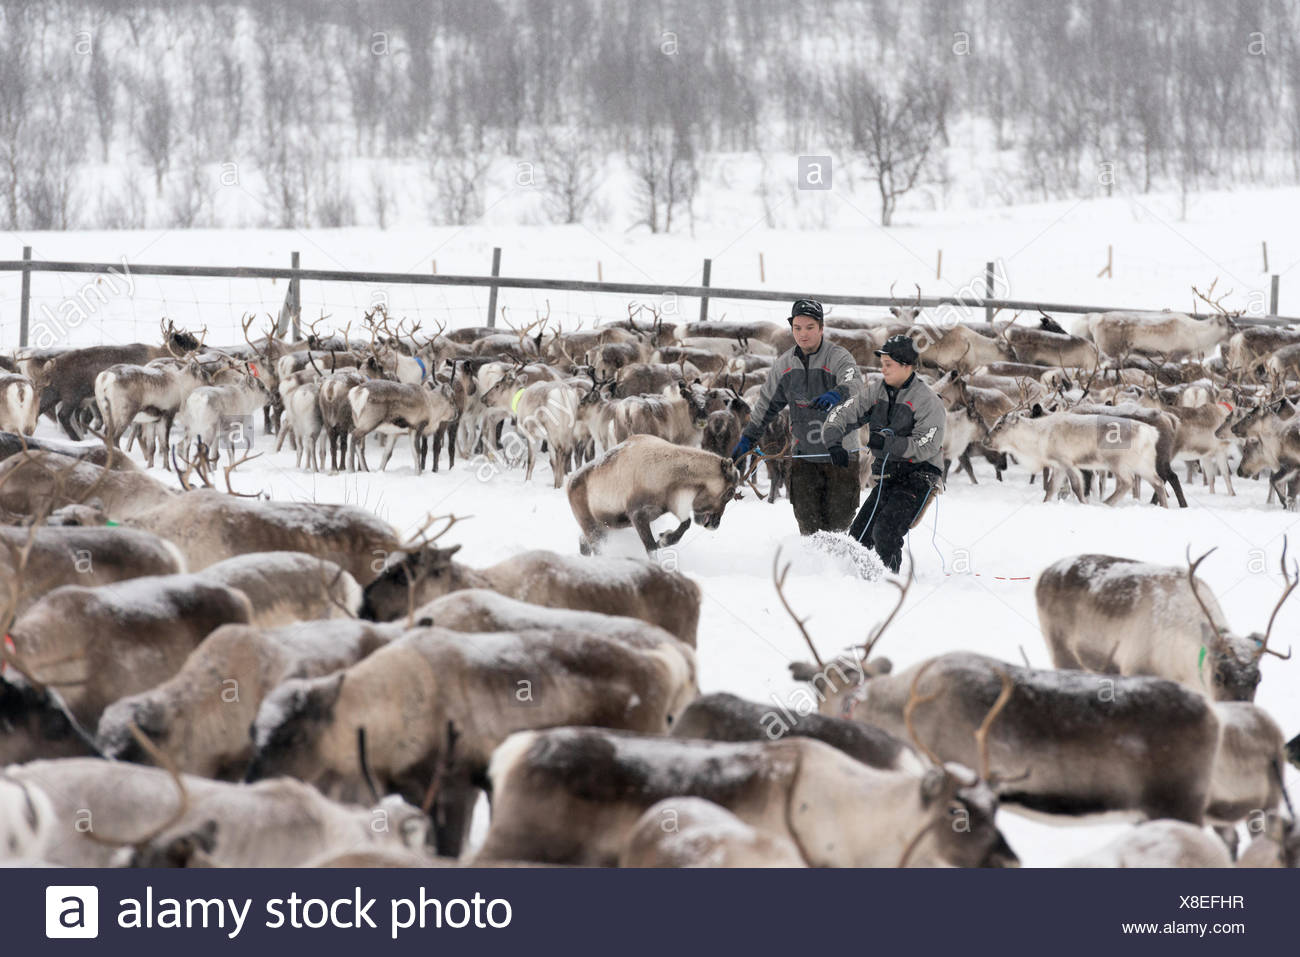 Sami reindeer herders contrassegnare i vitelli in inverno. Immagini Stock